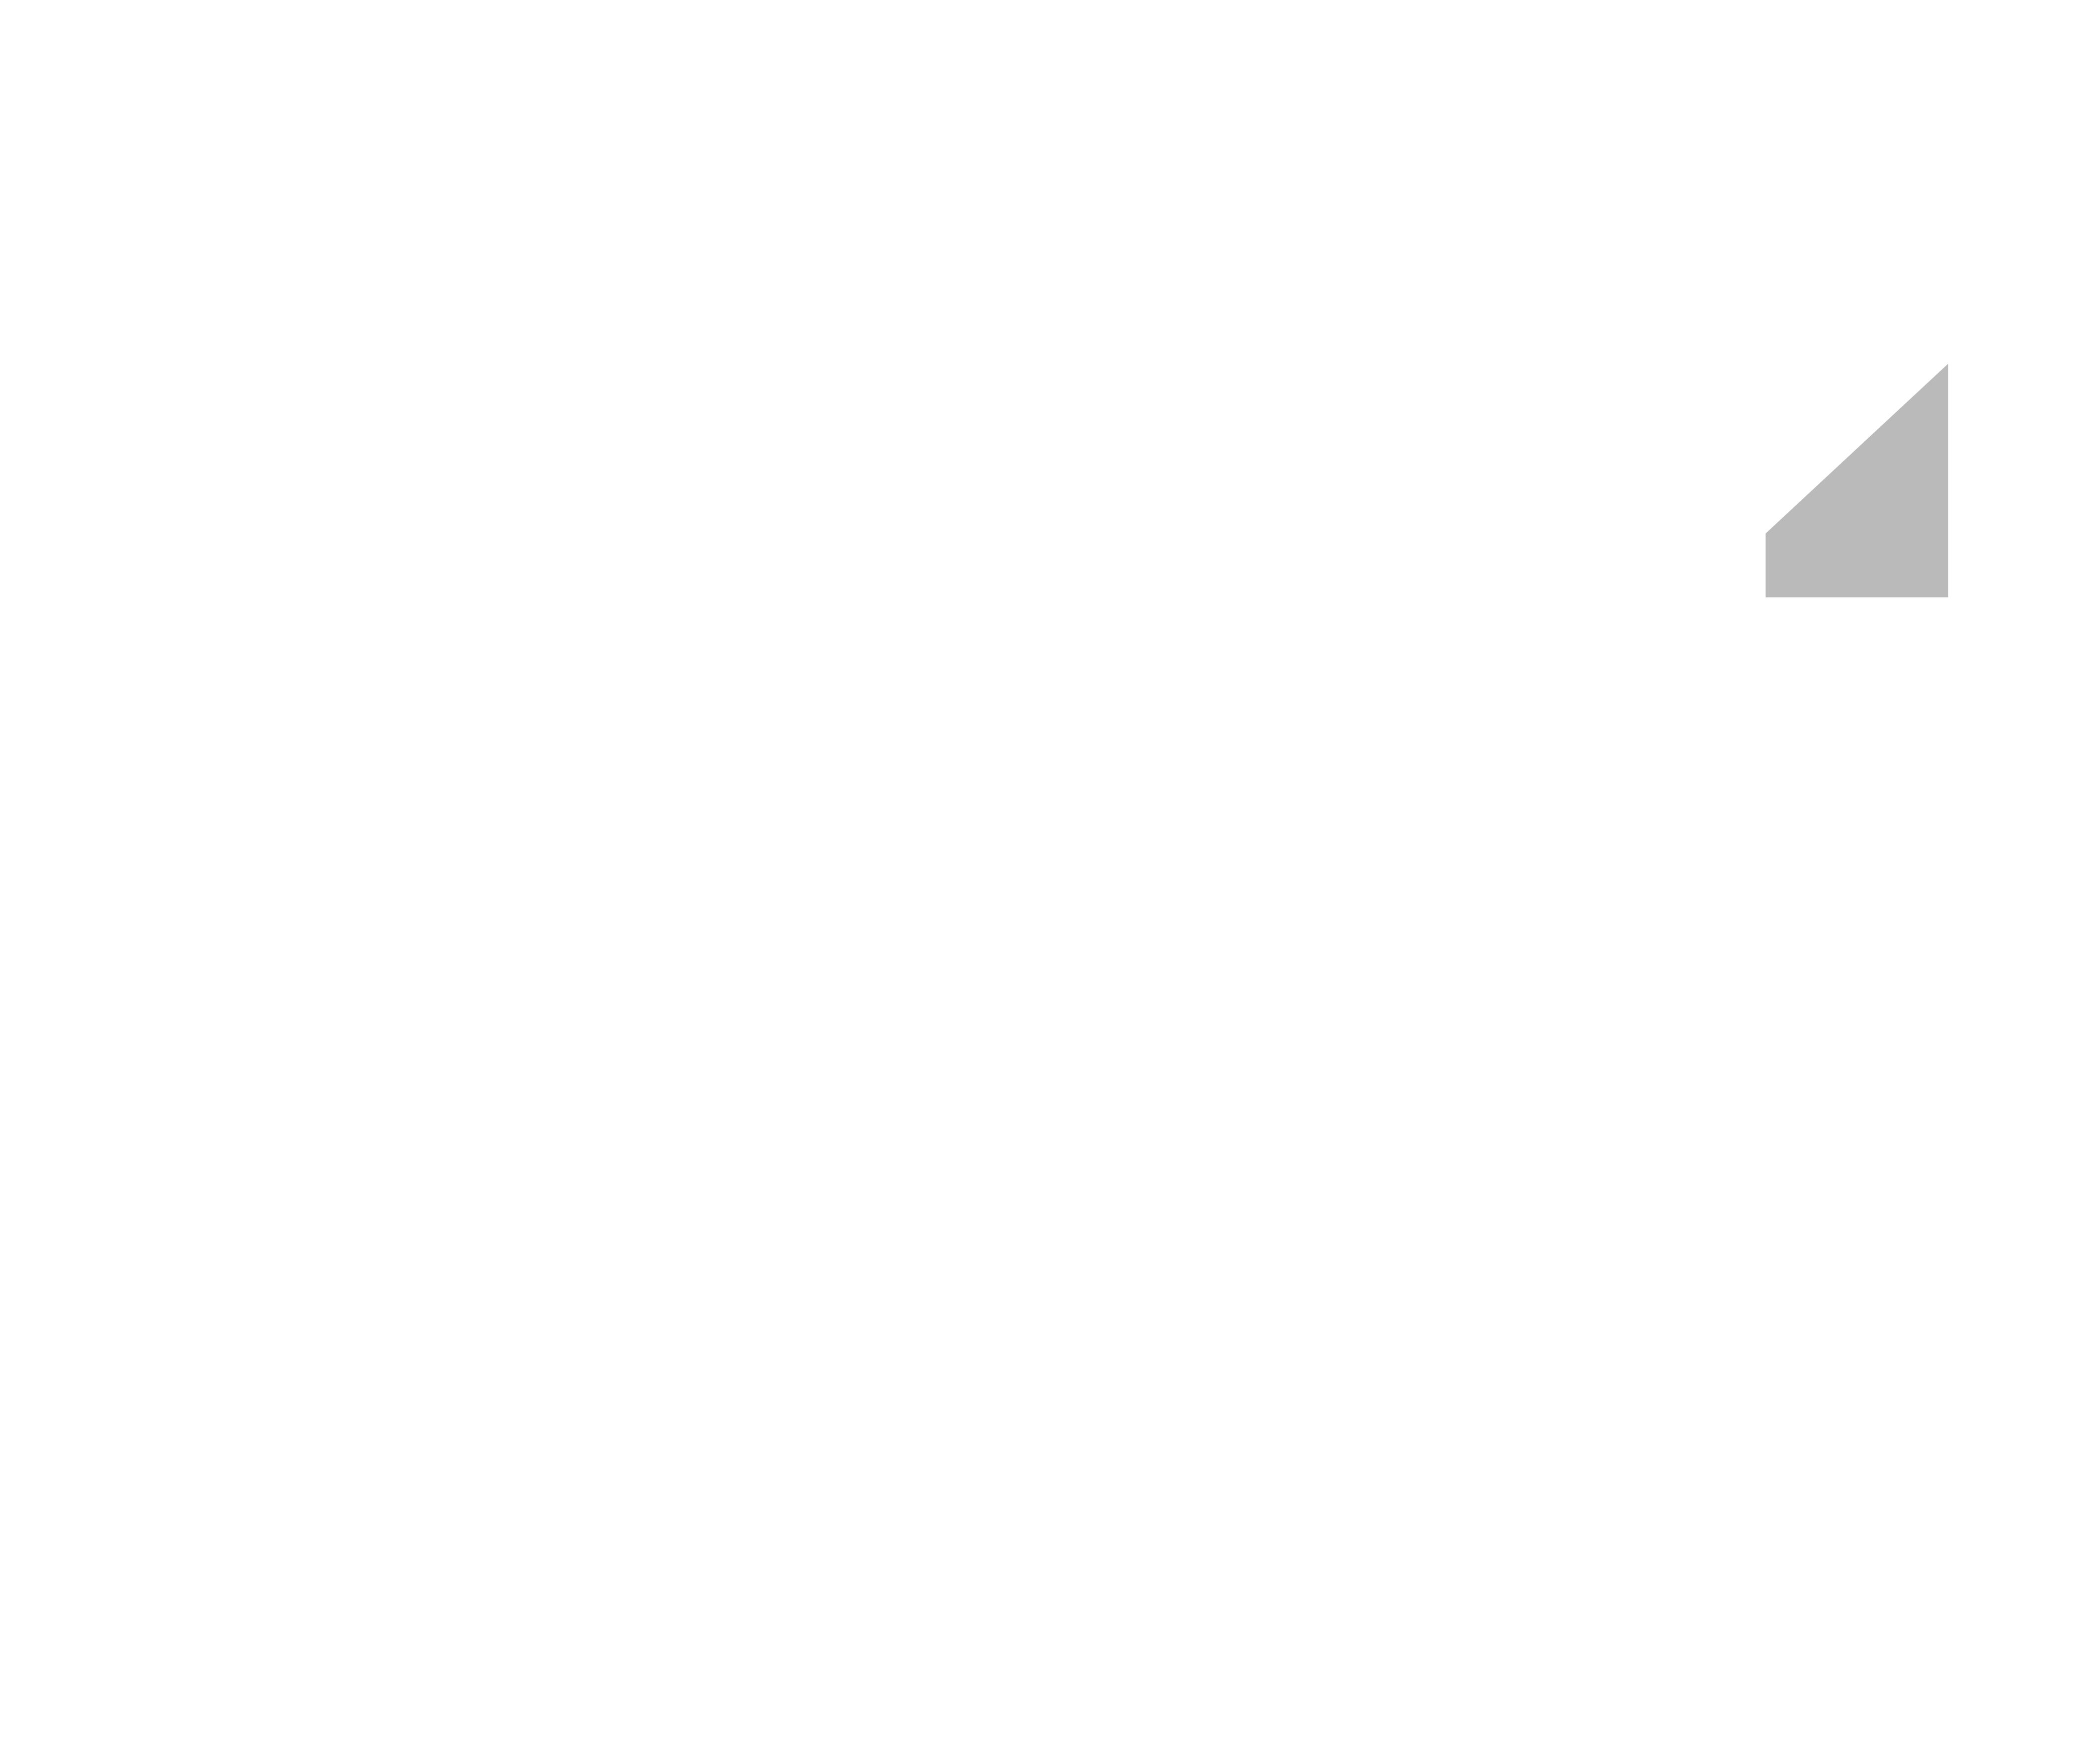 Bit Studio Final logo-03